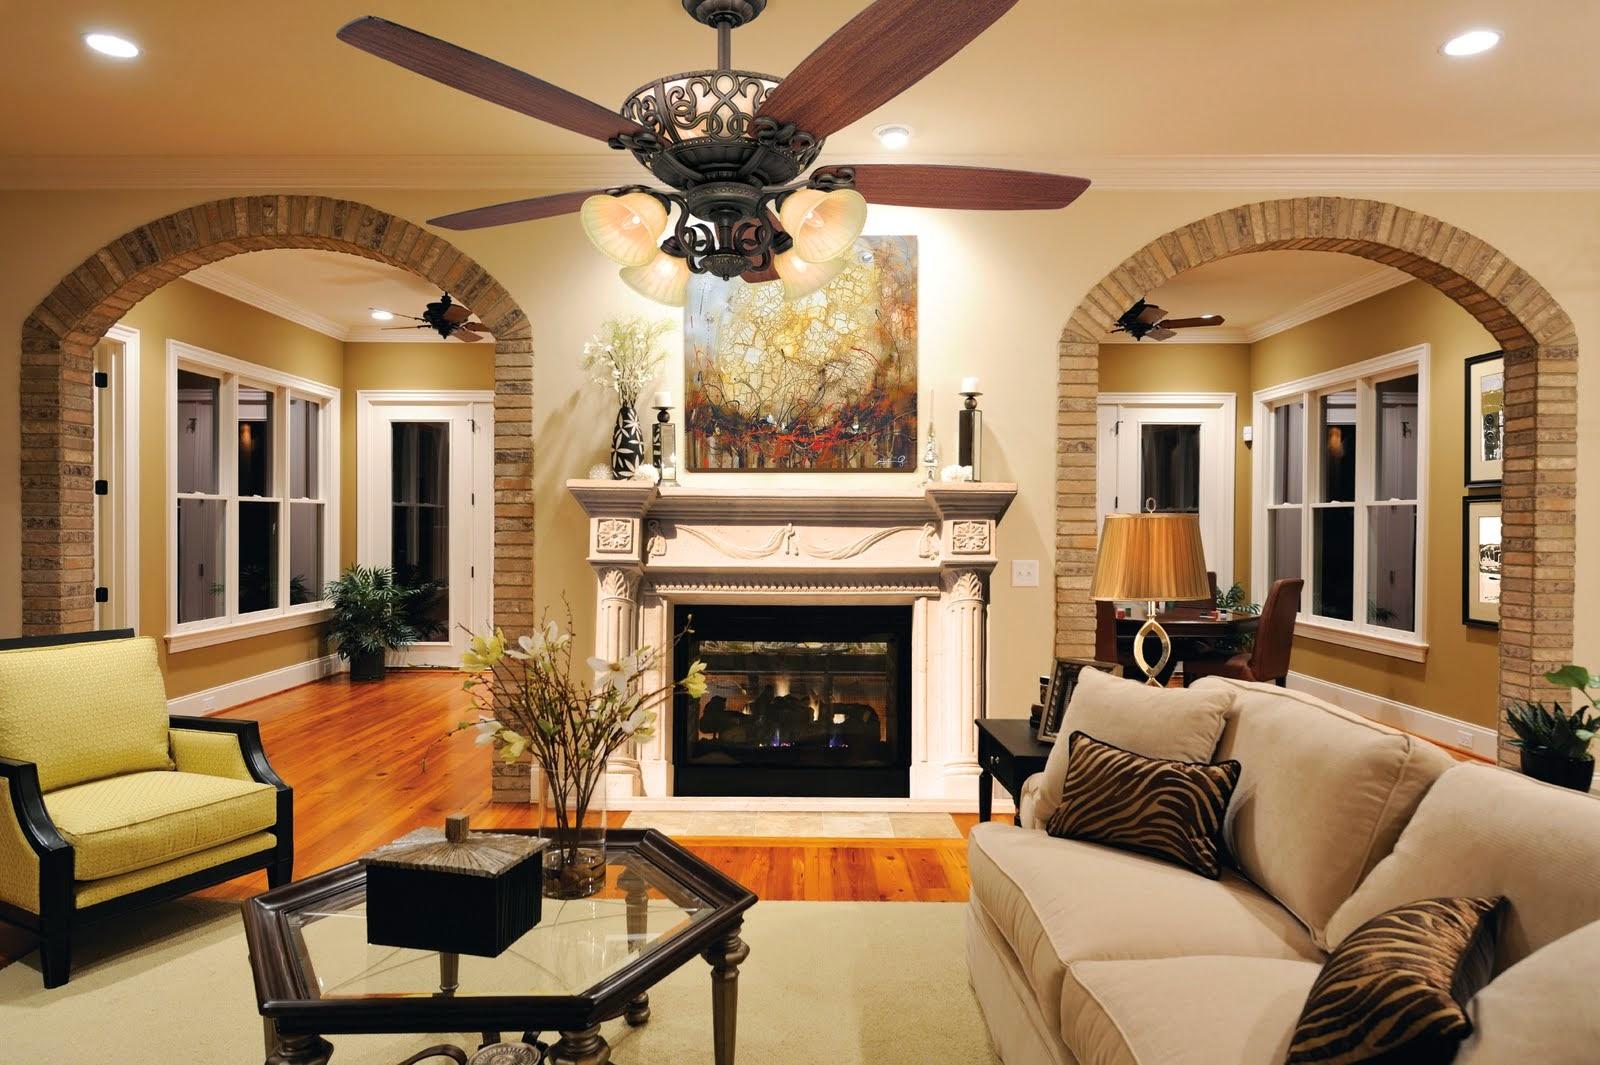 Best Sites For Home Decor Home Decor Target Home Decor Cheap